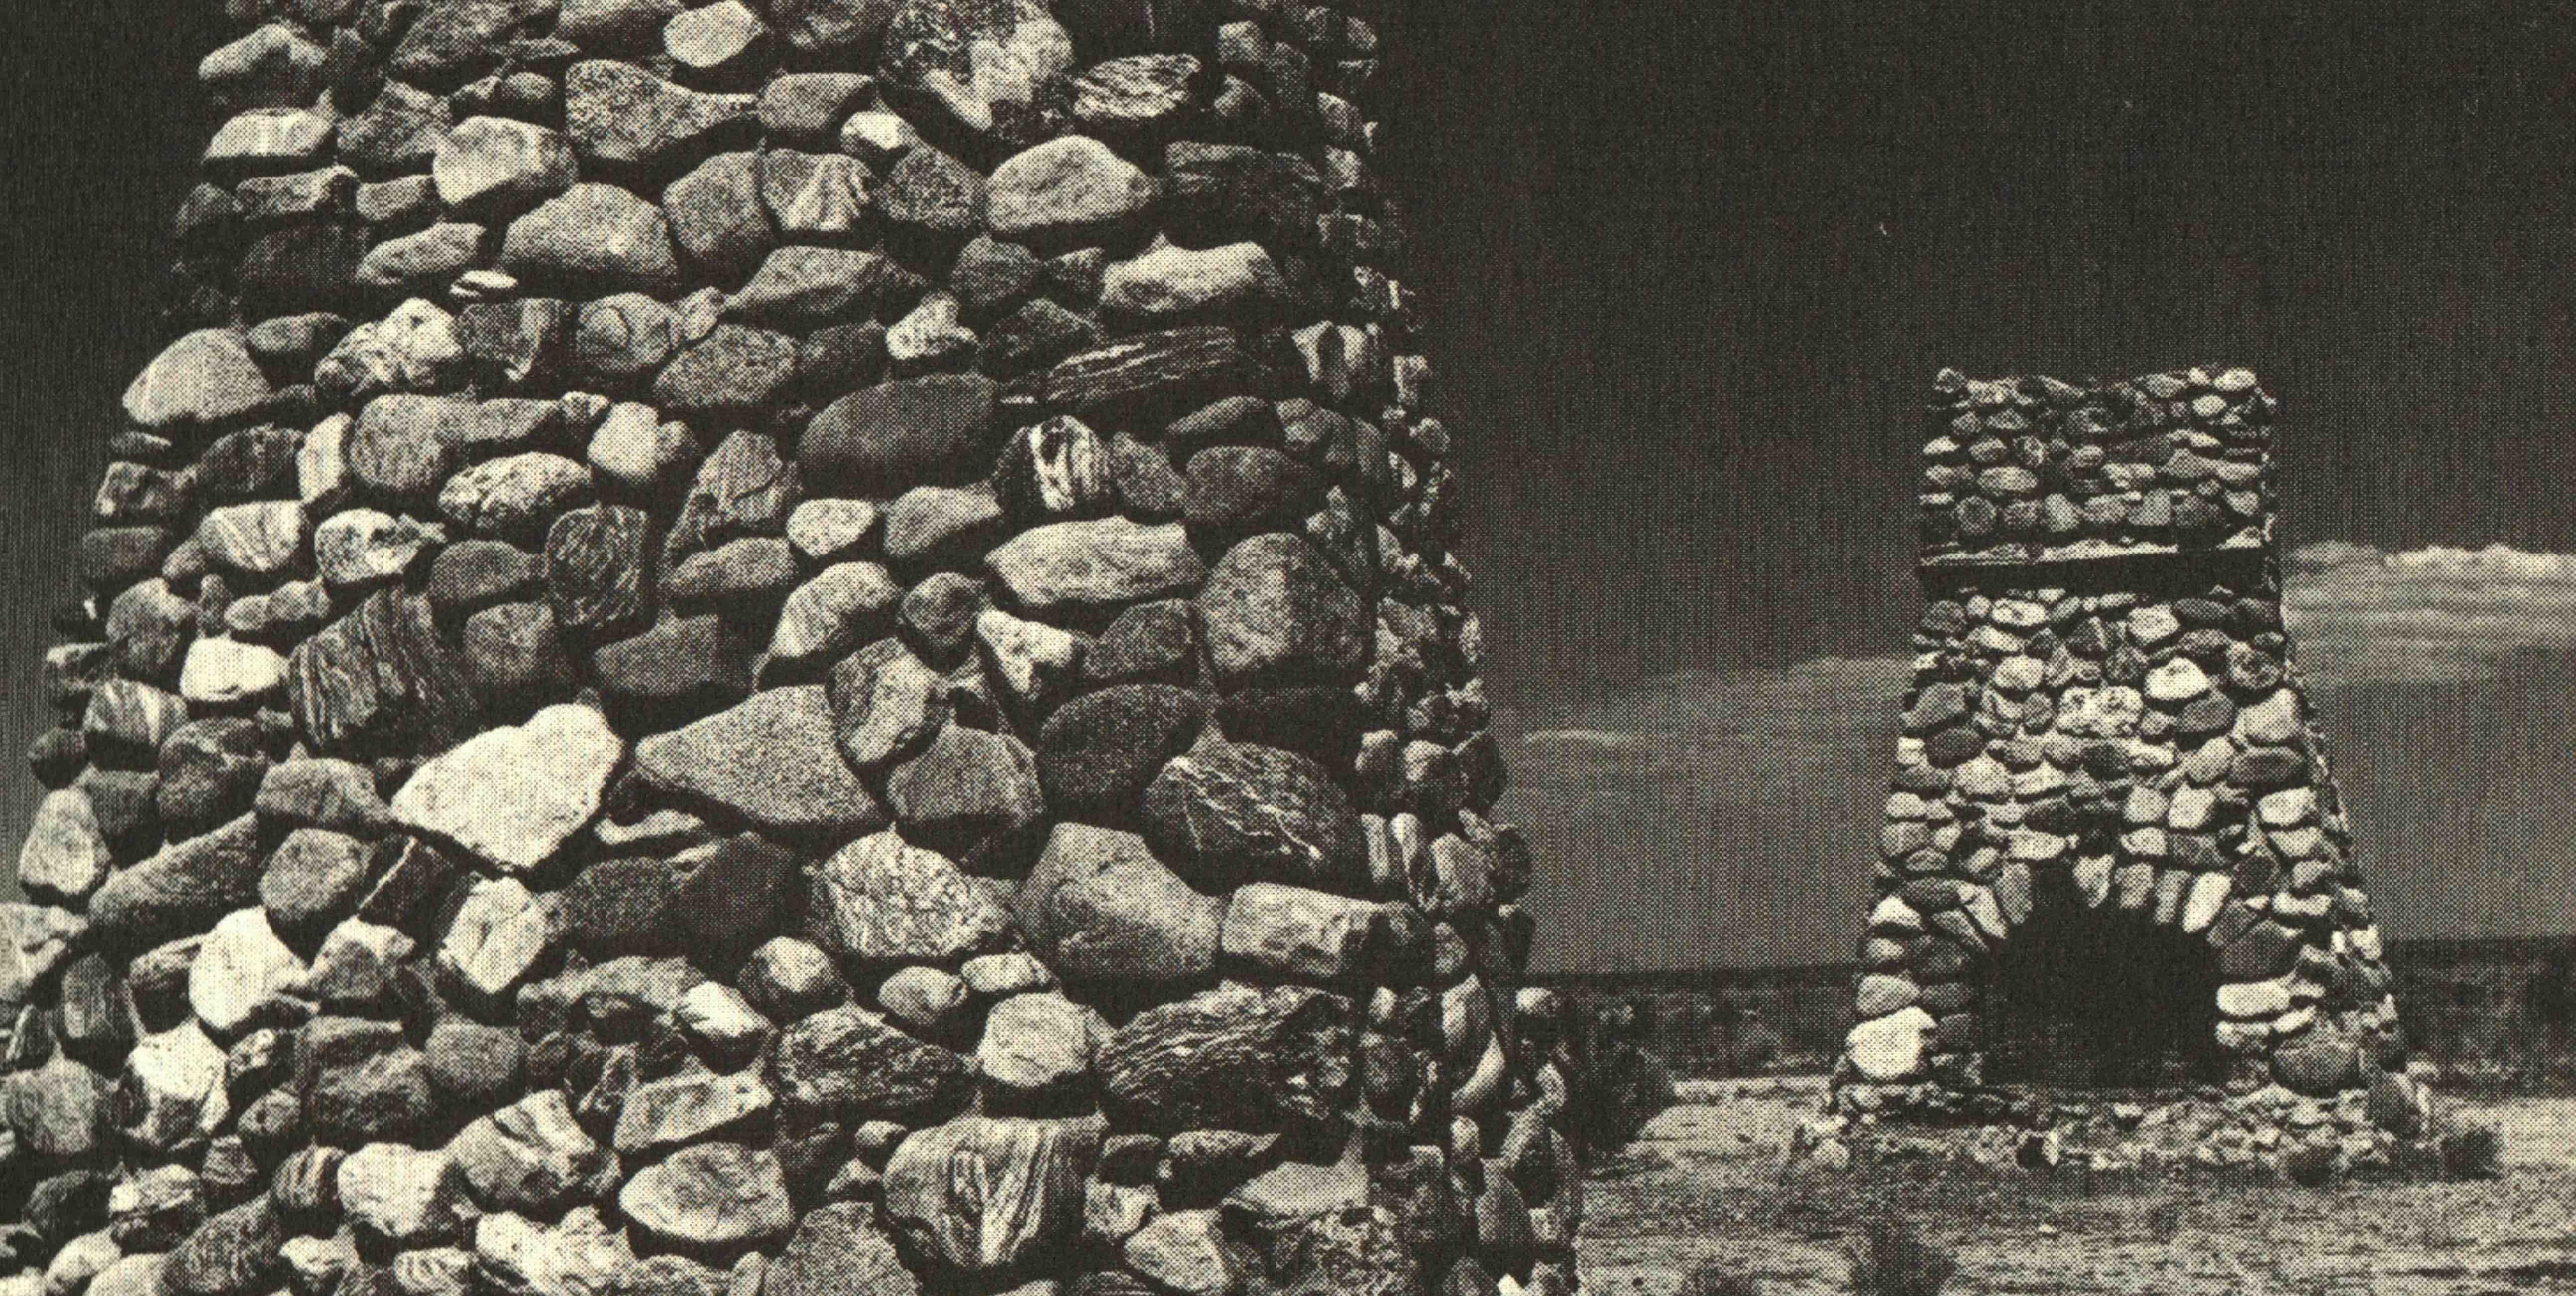 Desert Visionaries: Llano del Rio, St. Andrew's Monastery, & Aldous Huxley's Pearblossom Ranch